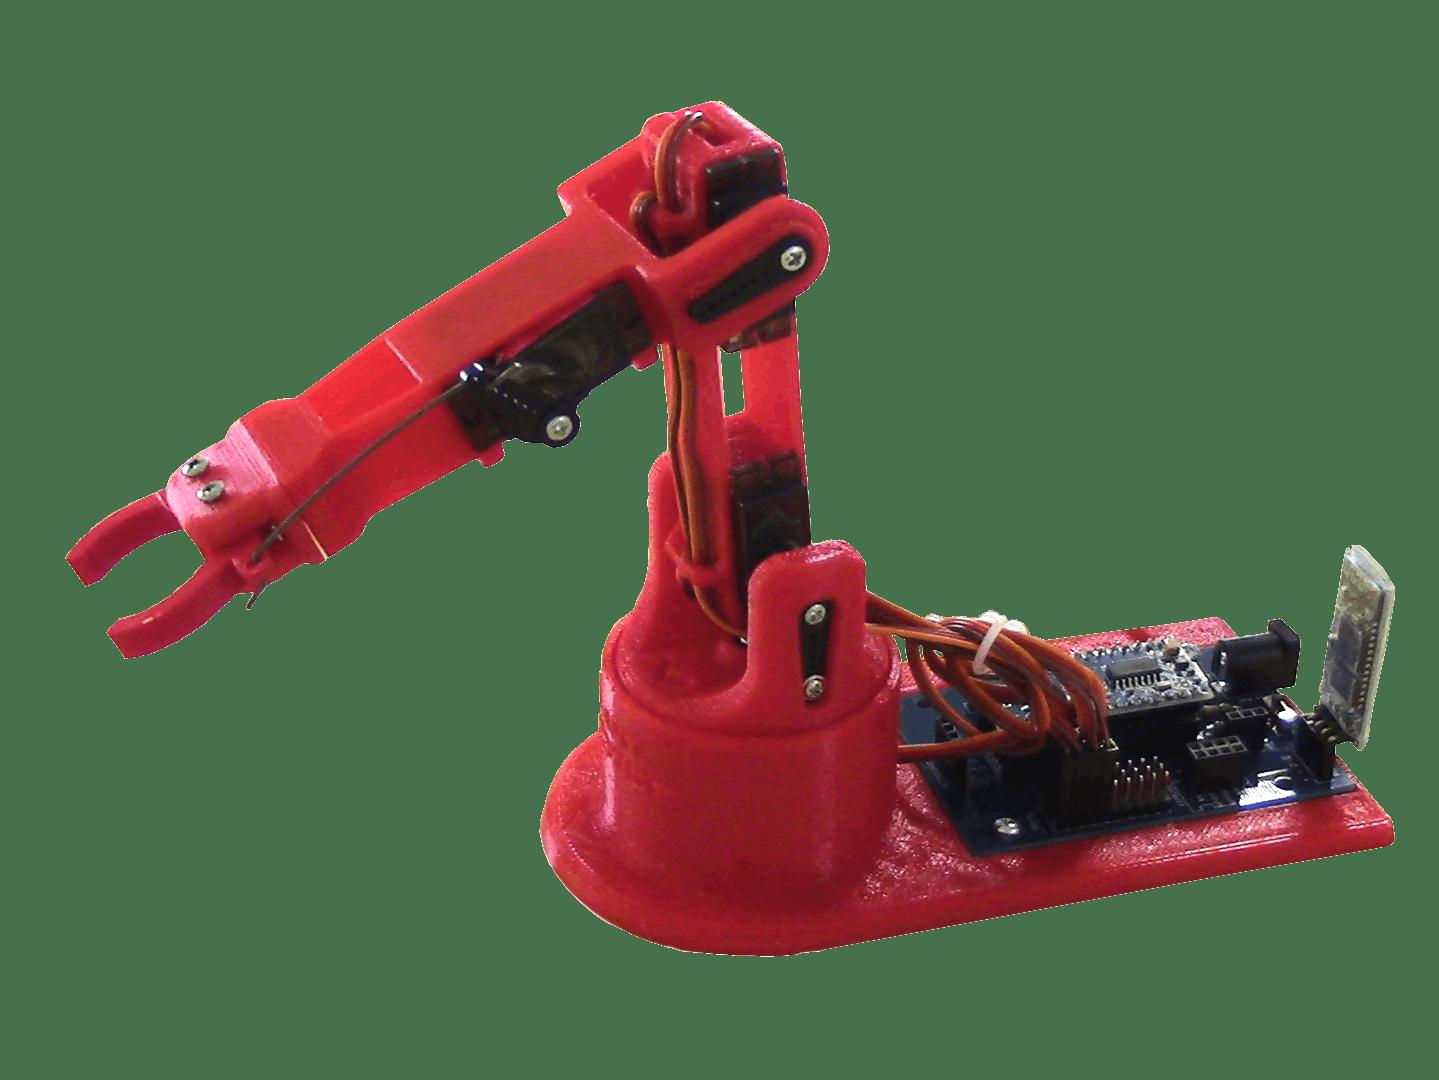 Littlearm 2C: Build a 3D Printed Arduino Robot Arm